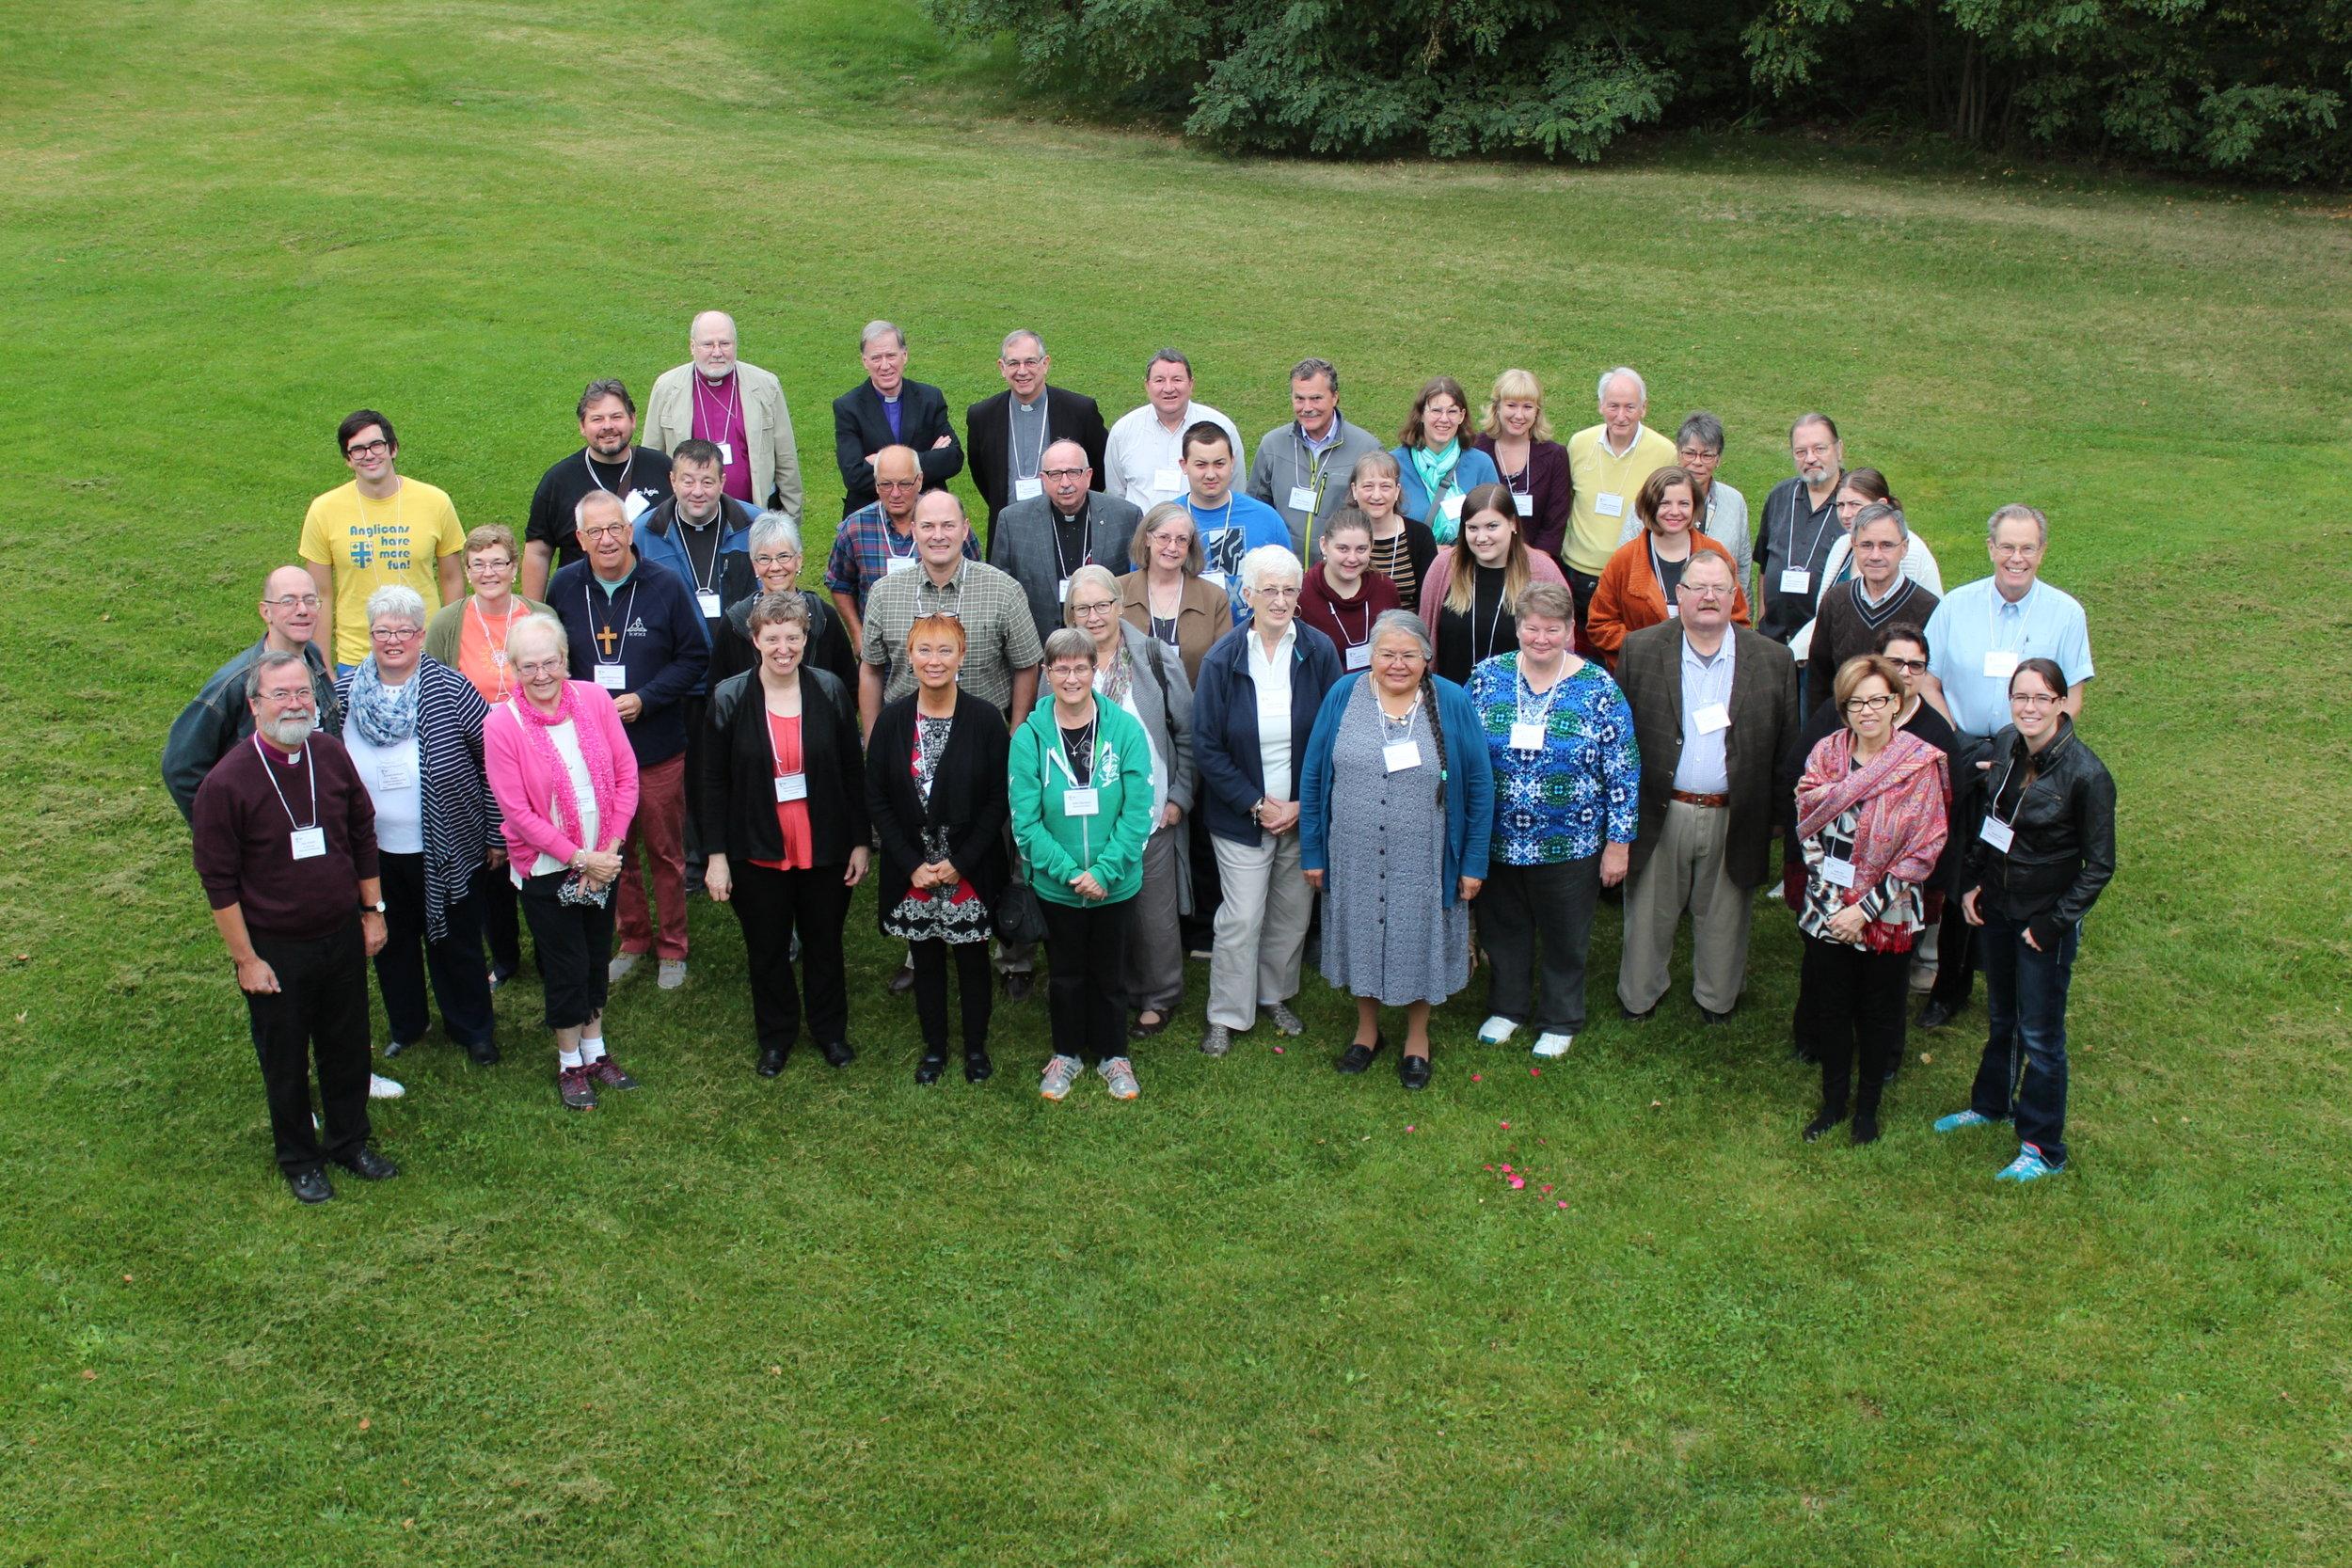 delegates at provincial synod 2015 at sorrento centre